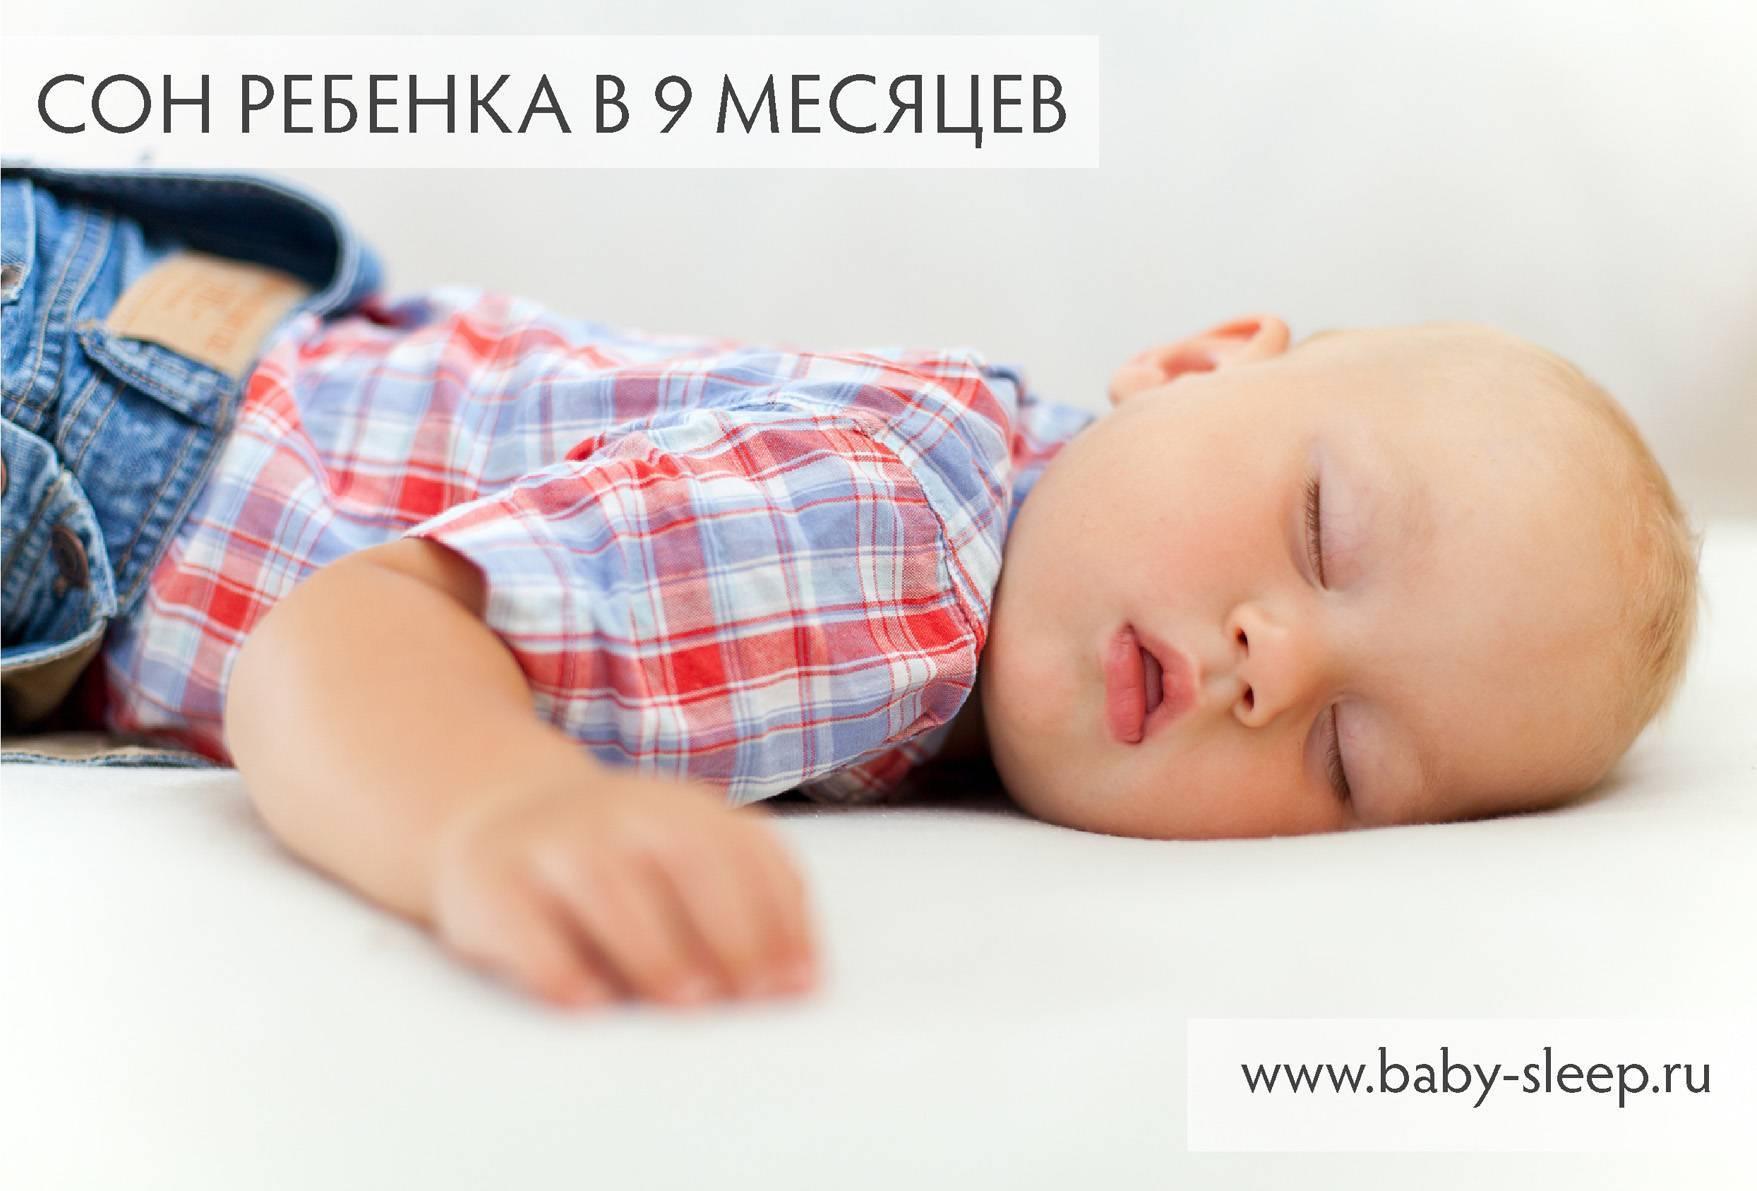 Характеристика структуры сна в грудном возрасте